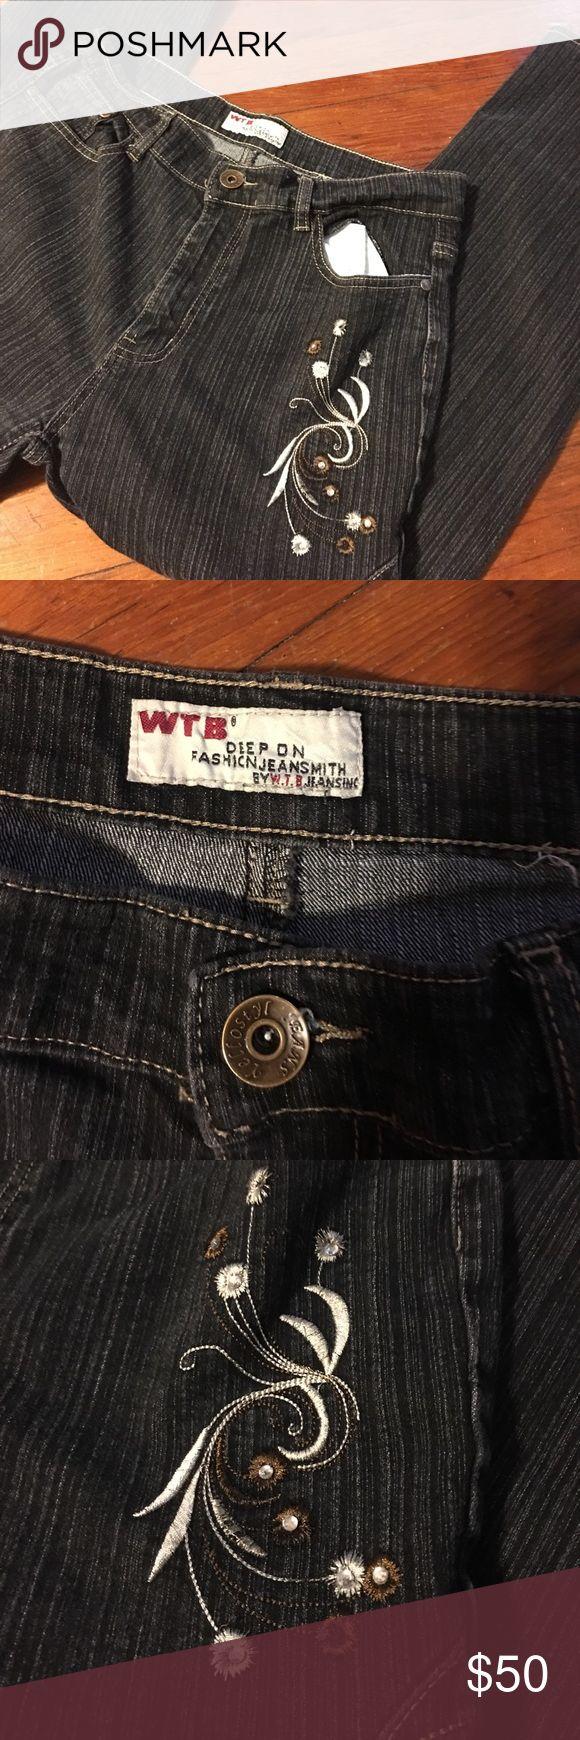 Spotted while shopping on Poshmark: WTB jean Smith Jeans 👖 embroidered!! #poshmark #fashion #shopping #style #WTB jean smith #Denim